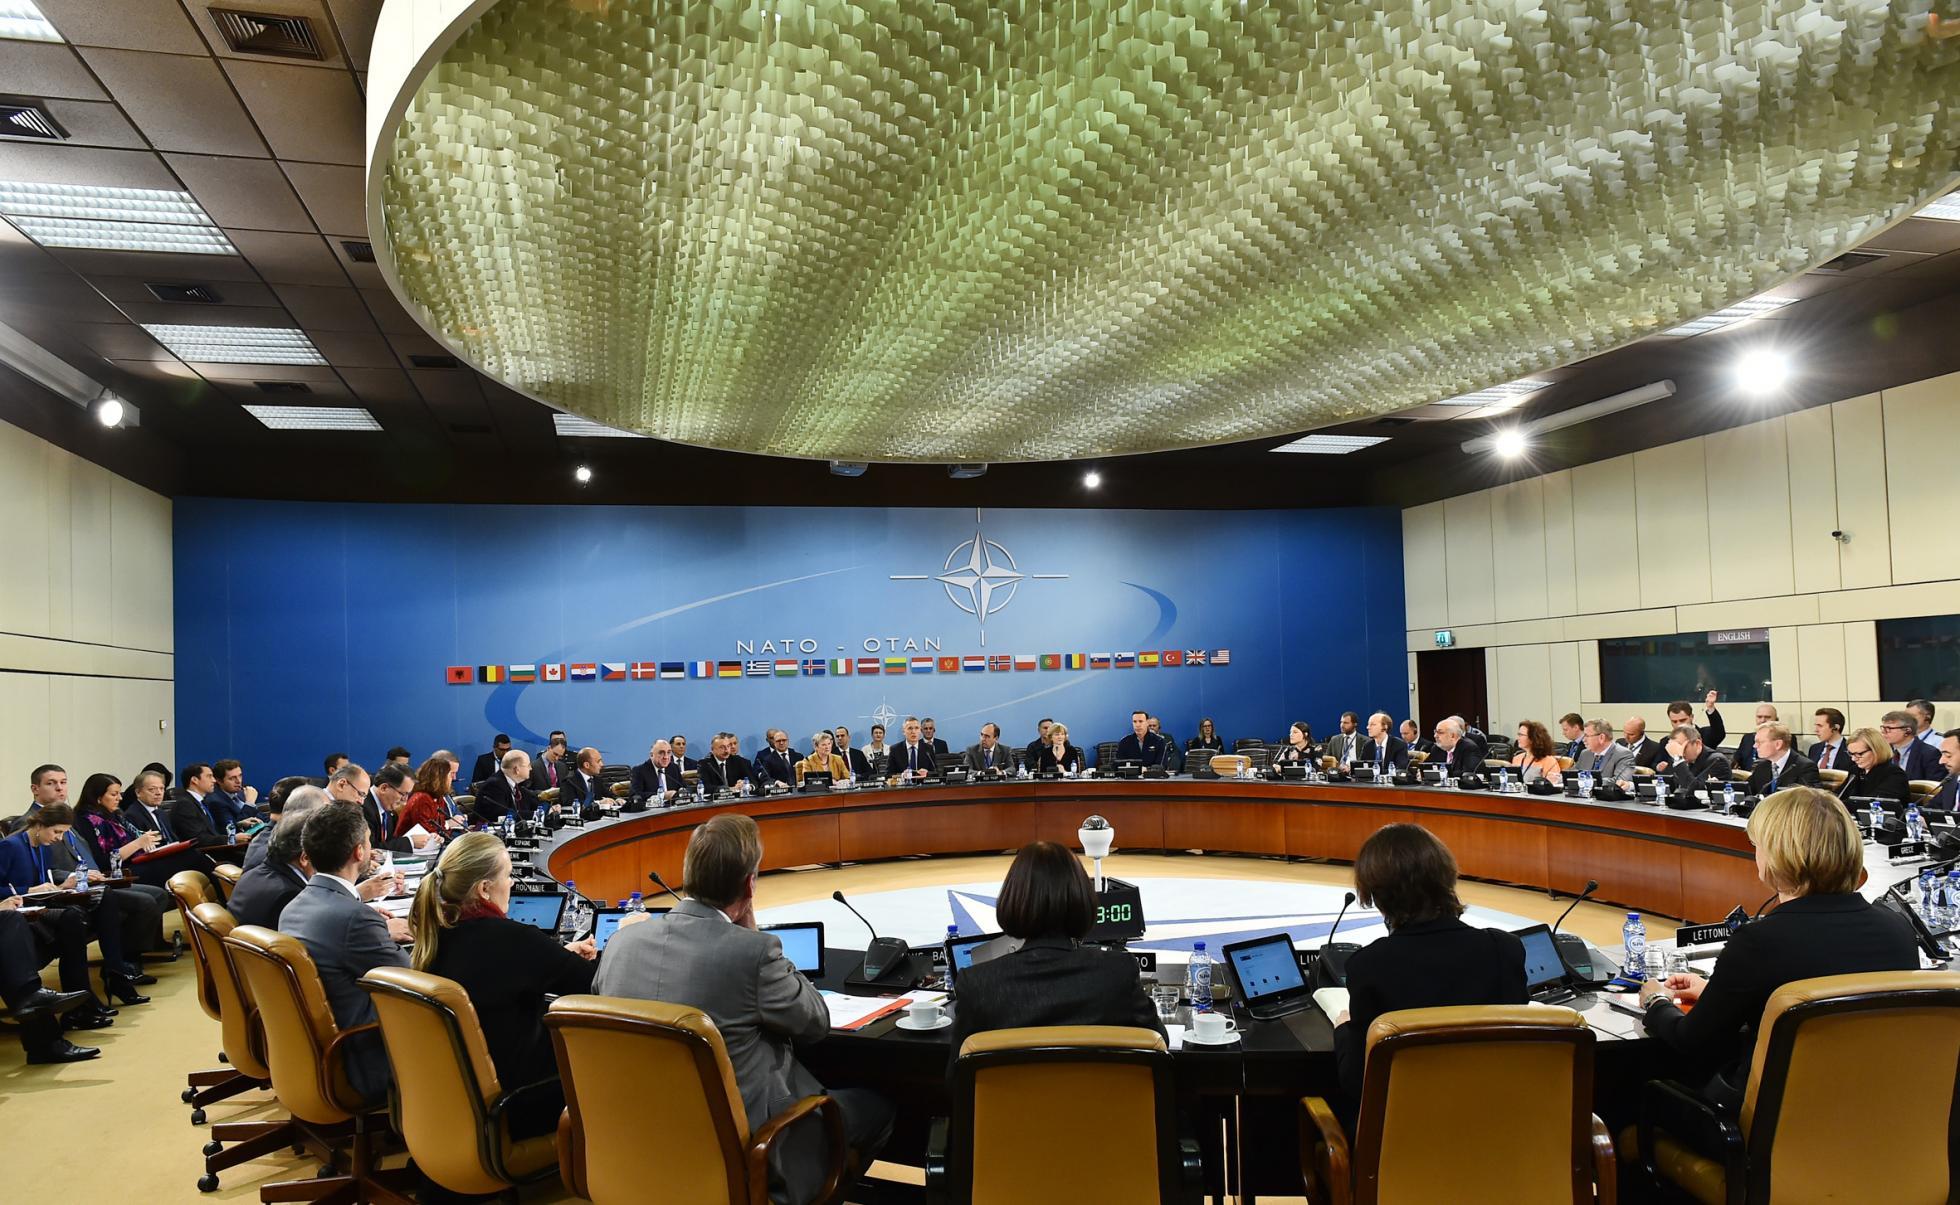 north atlantic council meeting - HD1960×1206